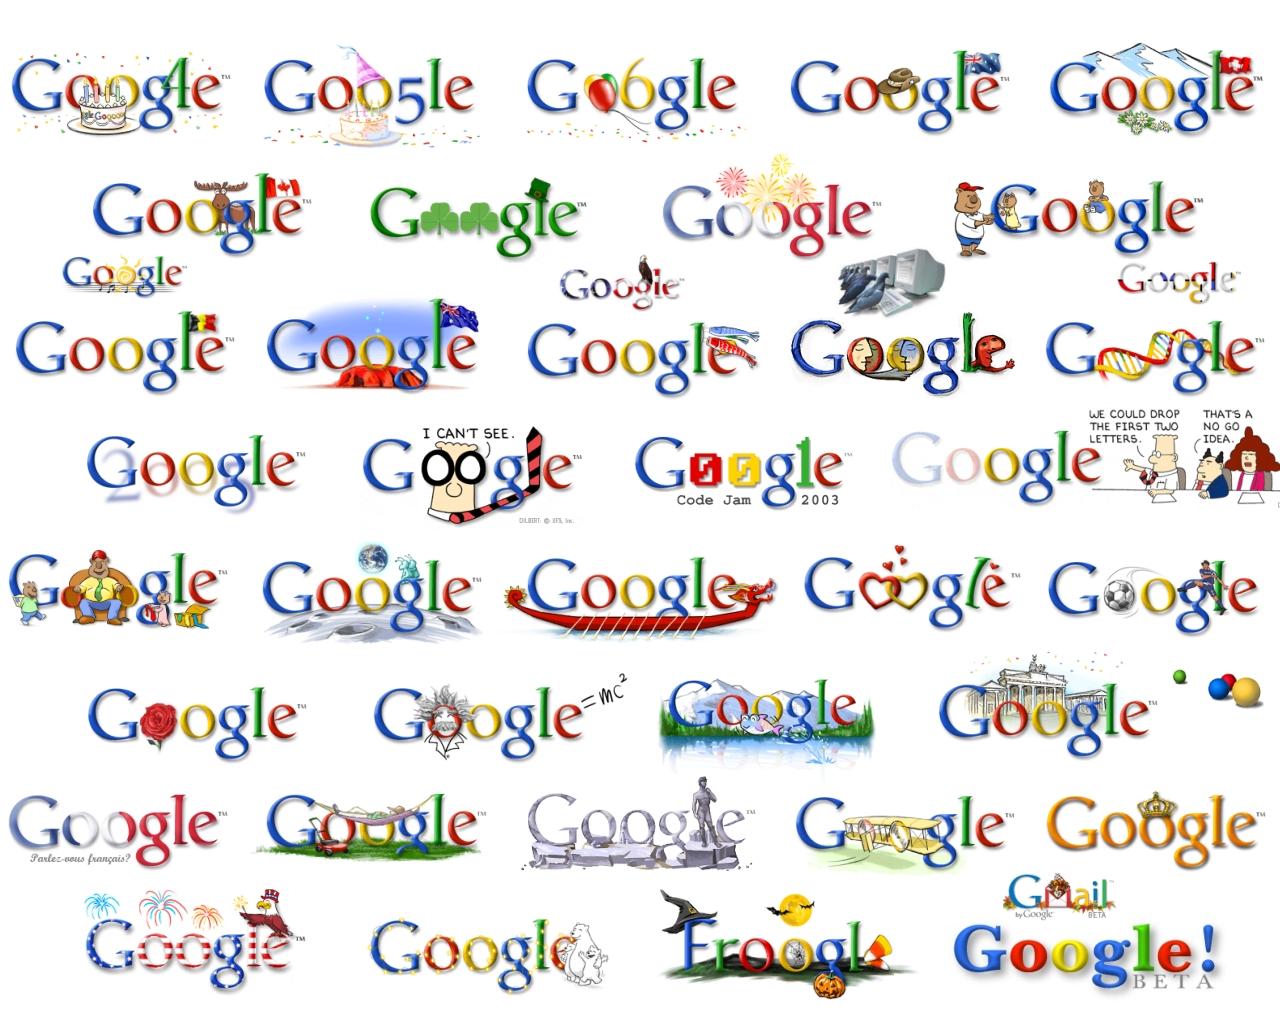 http://1.bp.blogspot.com/-zXgBvSk5zPo/Tj0mdVwIGTI/AAAAAAAARso/X_1_kAVd4Qo/s1600/google-wallpaper-logo.jpg